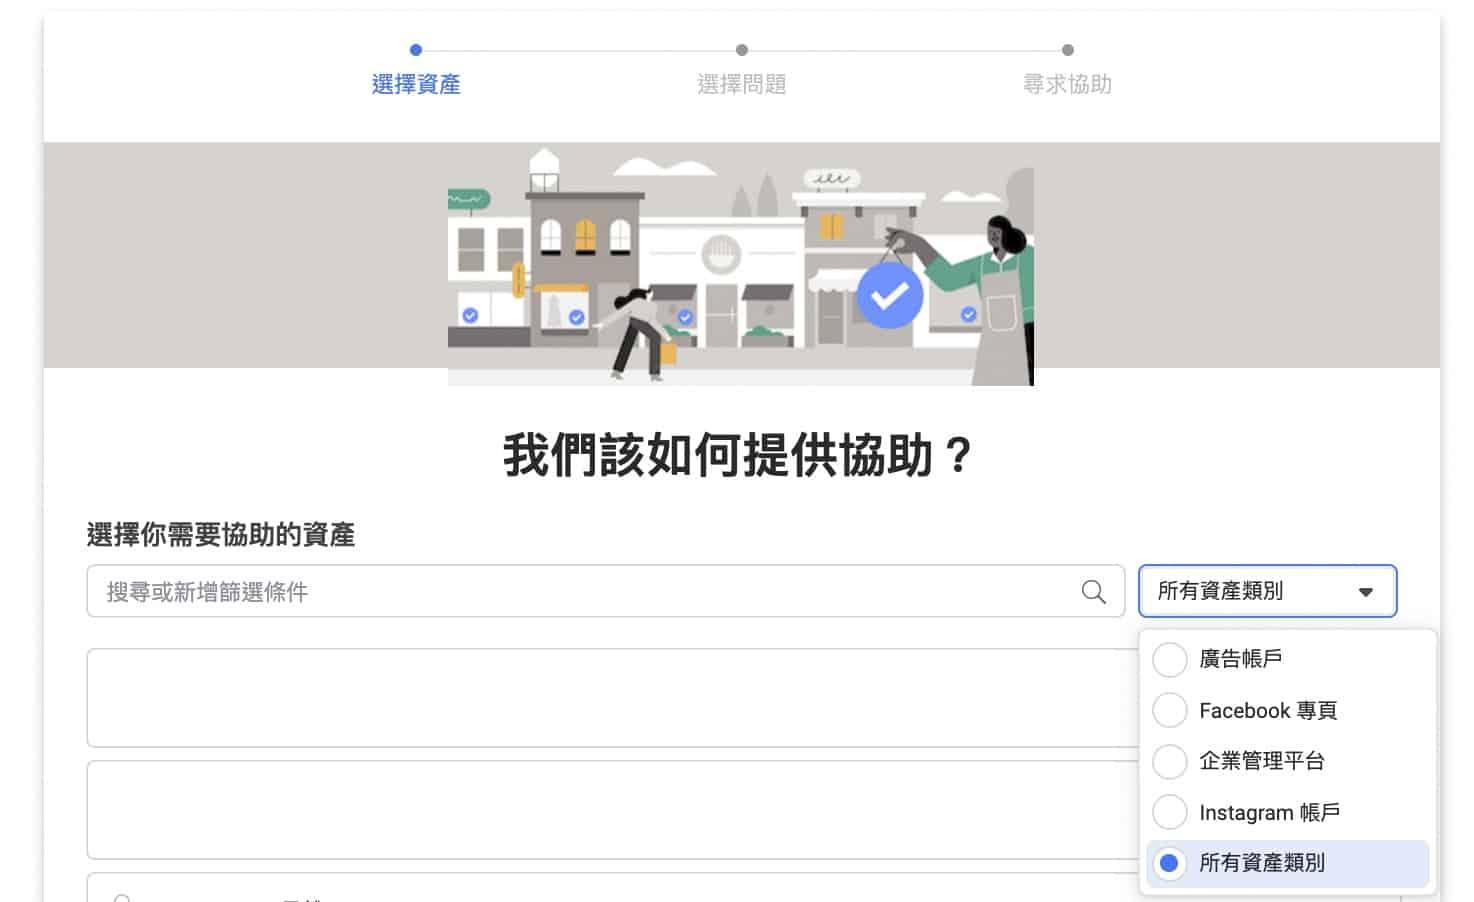 img 60d077cbc2dfa Facebook 商務管理平台(BM)/廣告帳戶被封鎖被封鎖、被停用的解決辦法(下):要求審查、聯絡客服、搬家